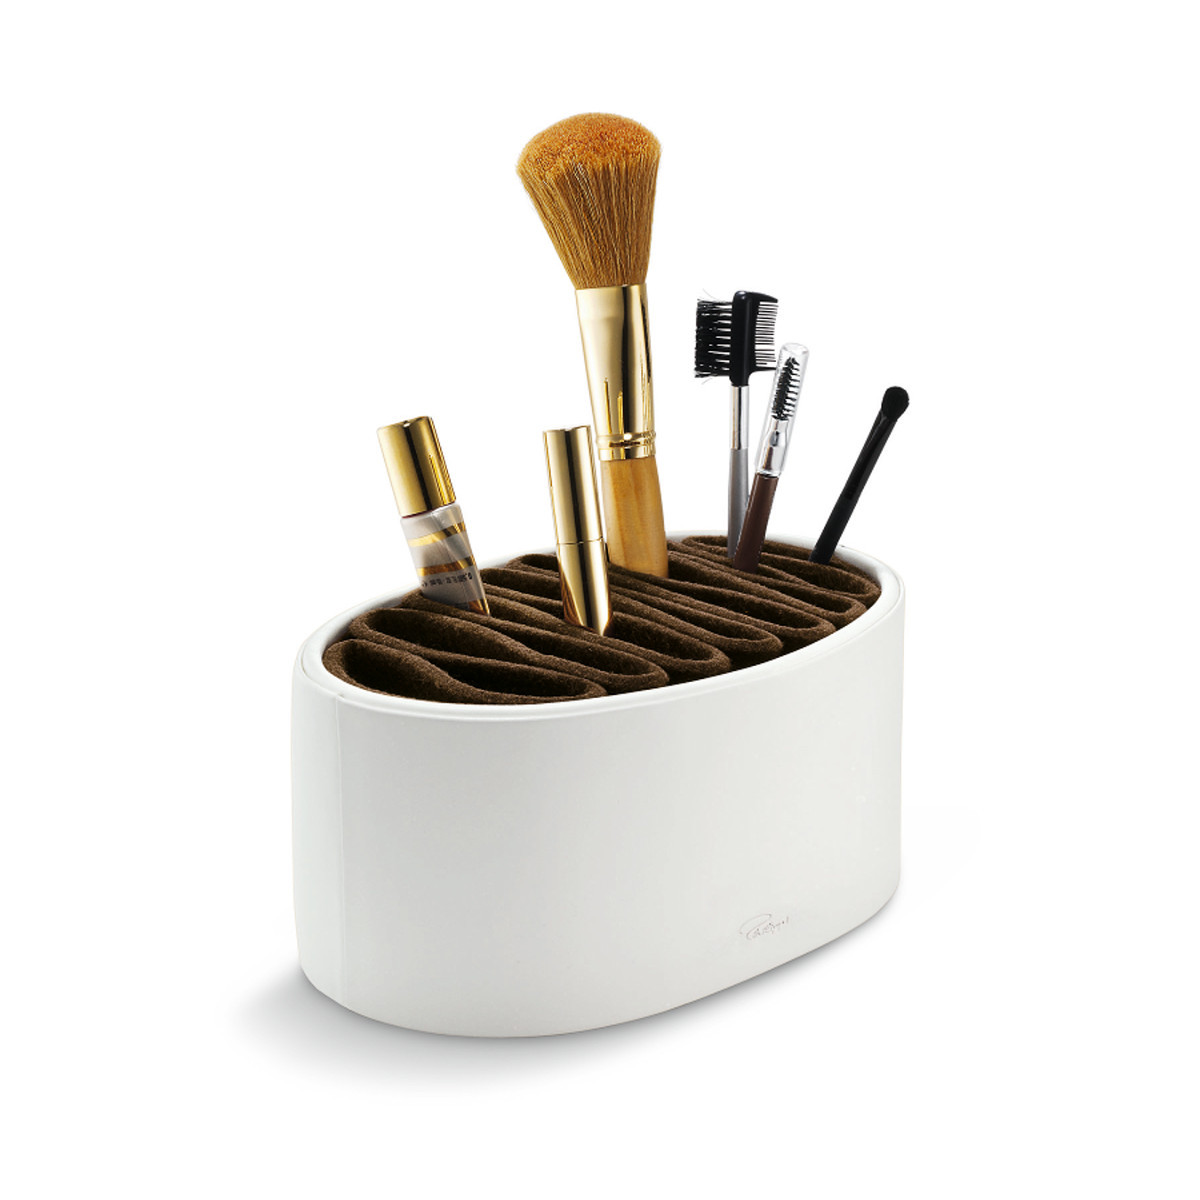 Kosmetik-Organizer von Philippi